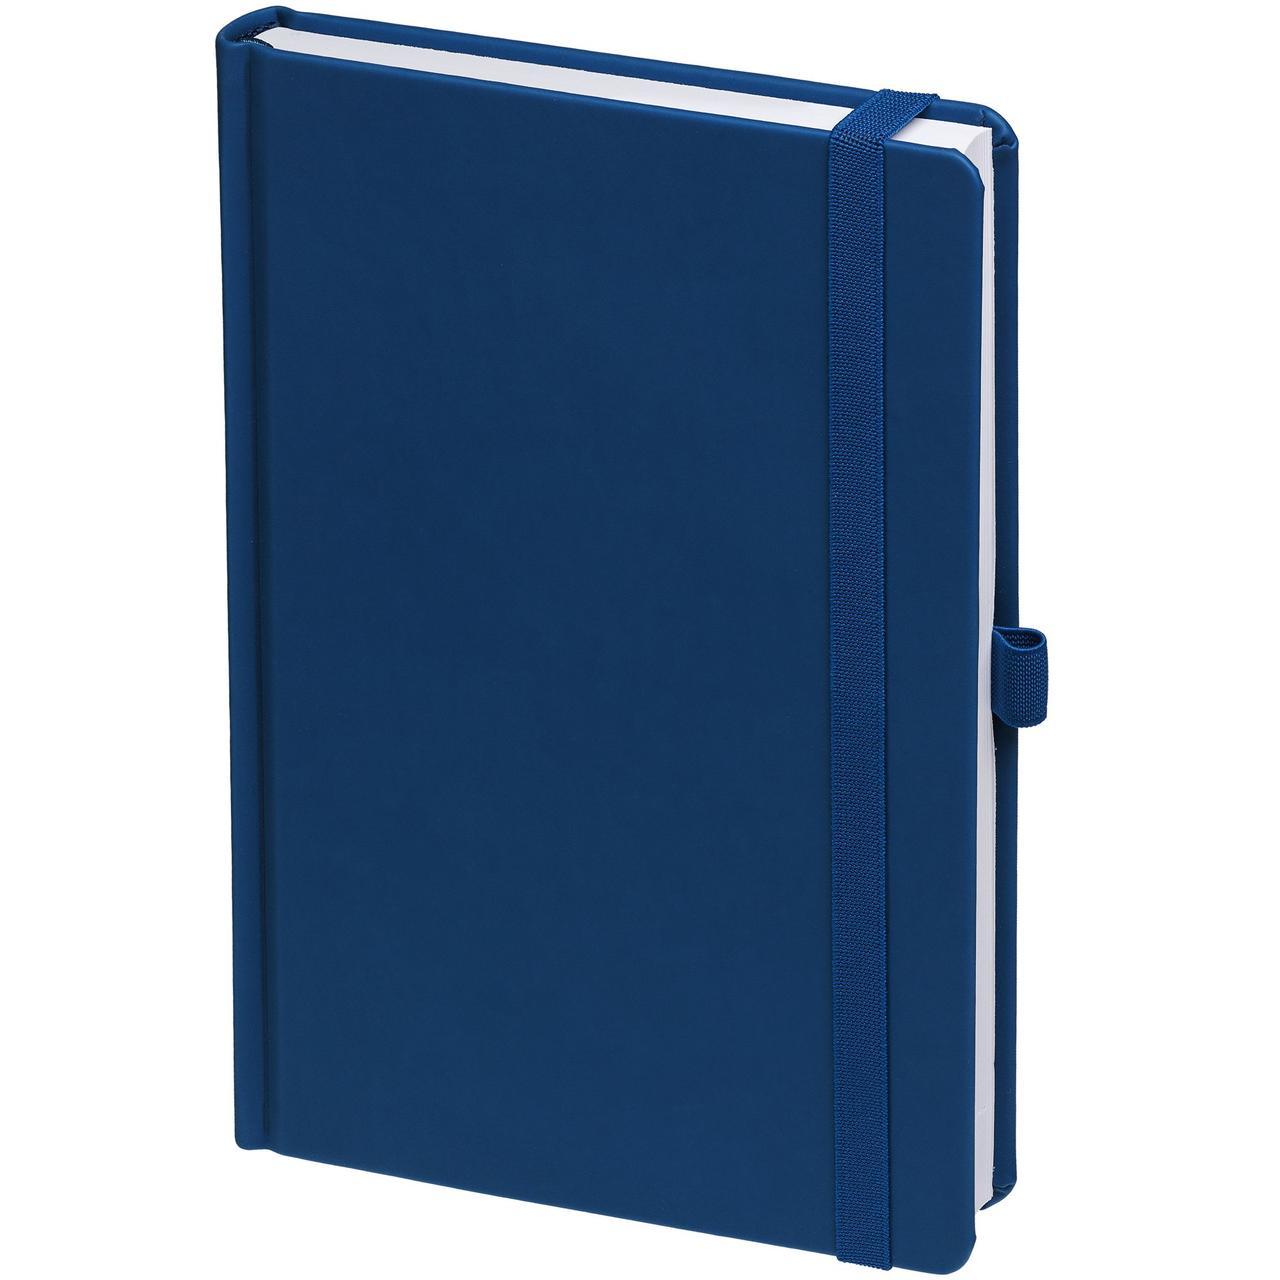 Ежедневник Favor, недатированный, синий (артикул 17072.40)